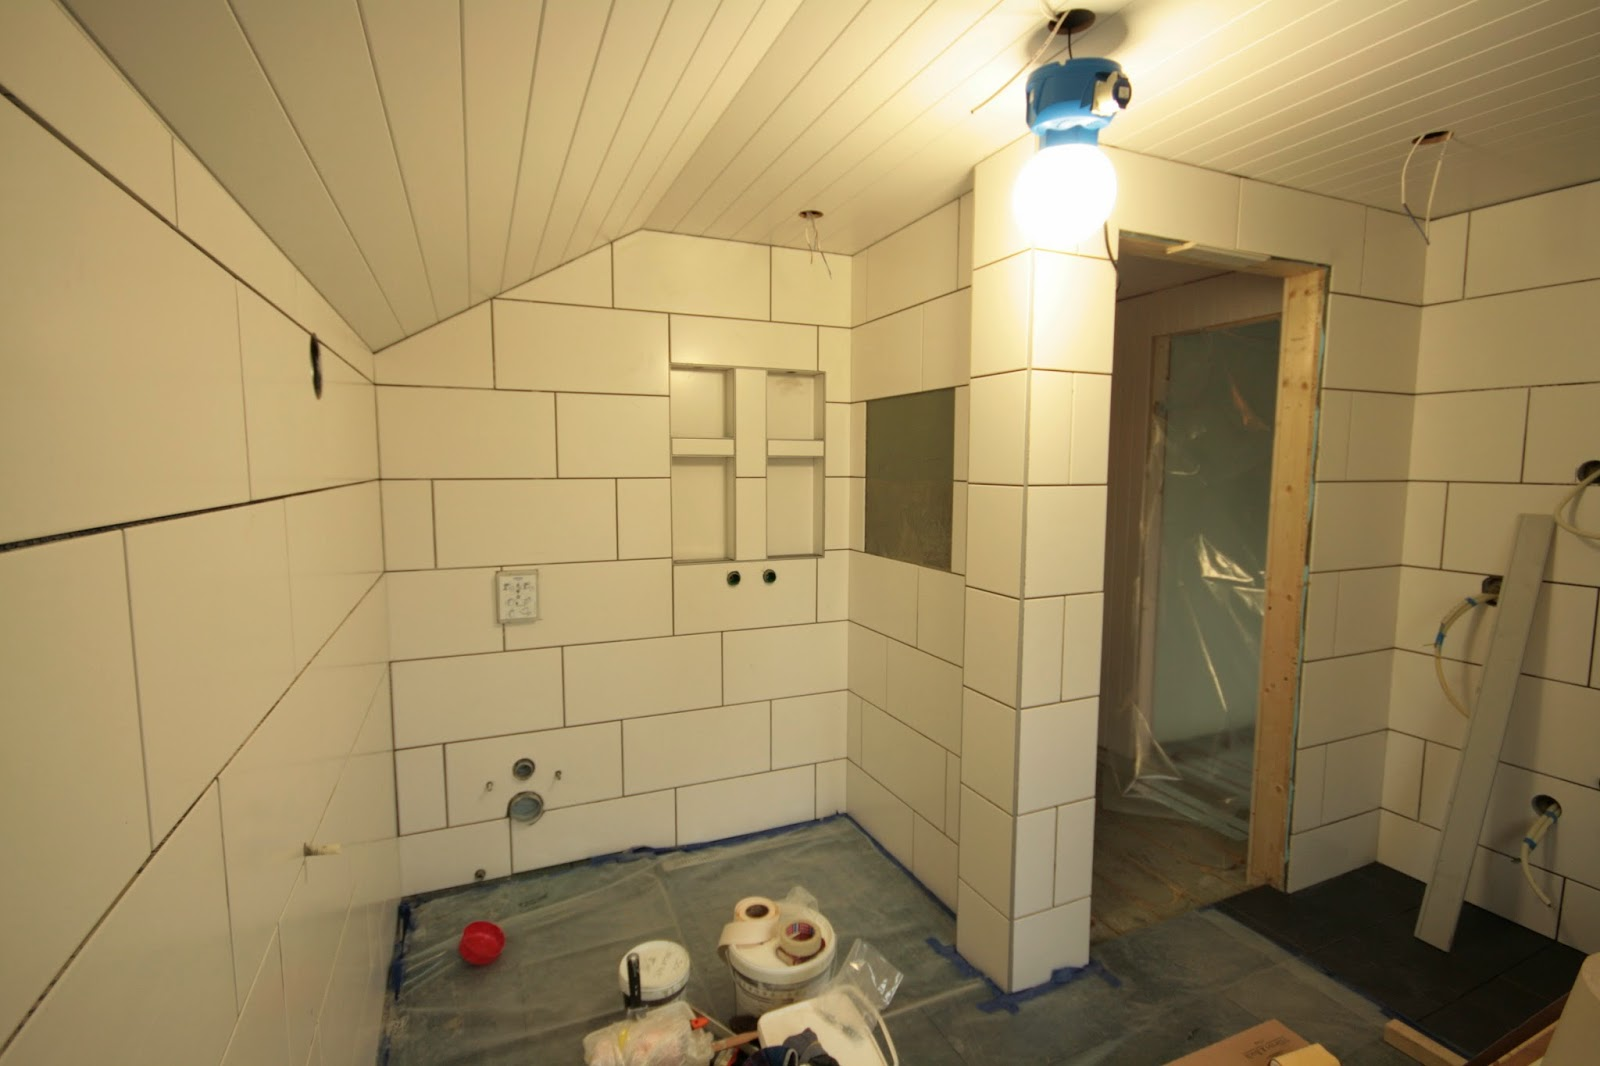 Villa holt engelstad: fliser på bad og pynt utvendig